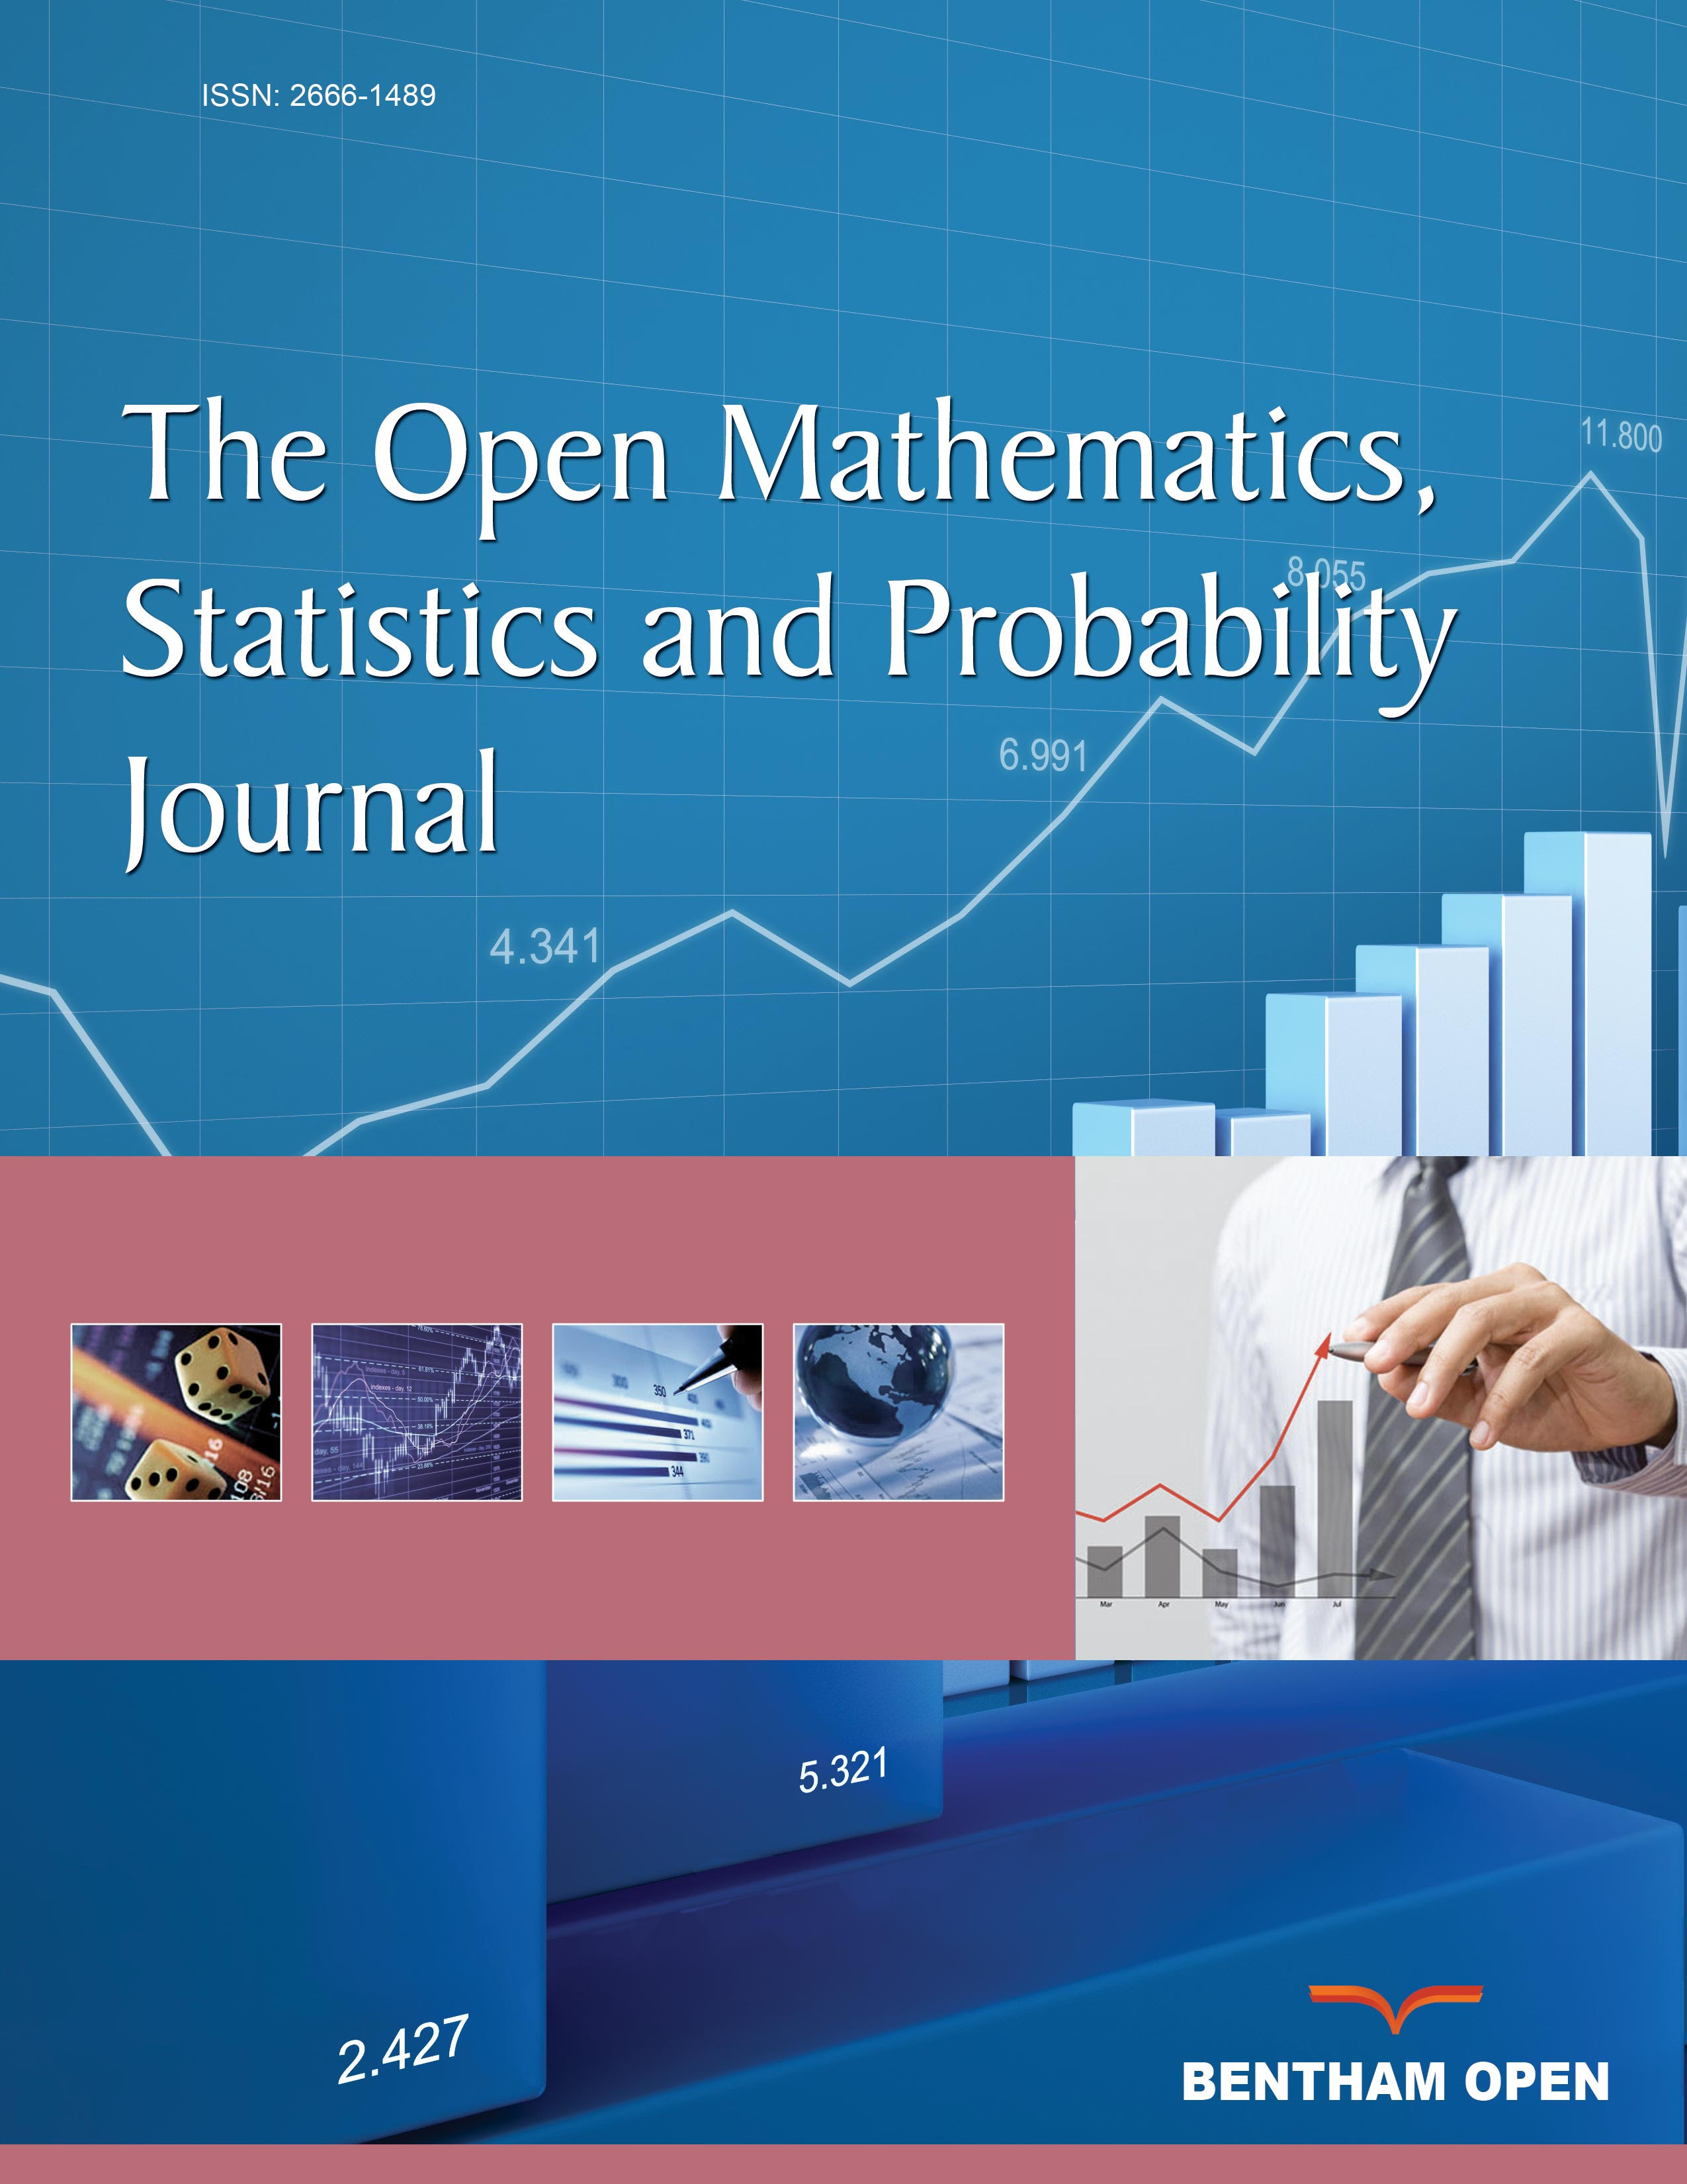 The Open Mathematics, Statistics and Probability Journal